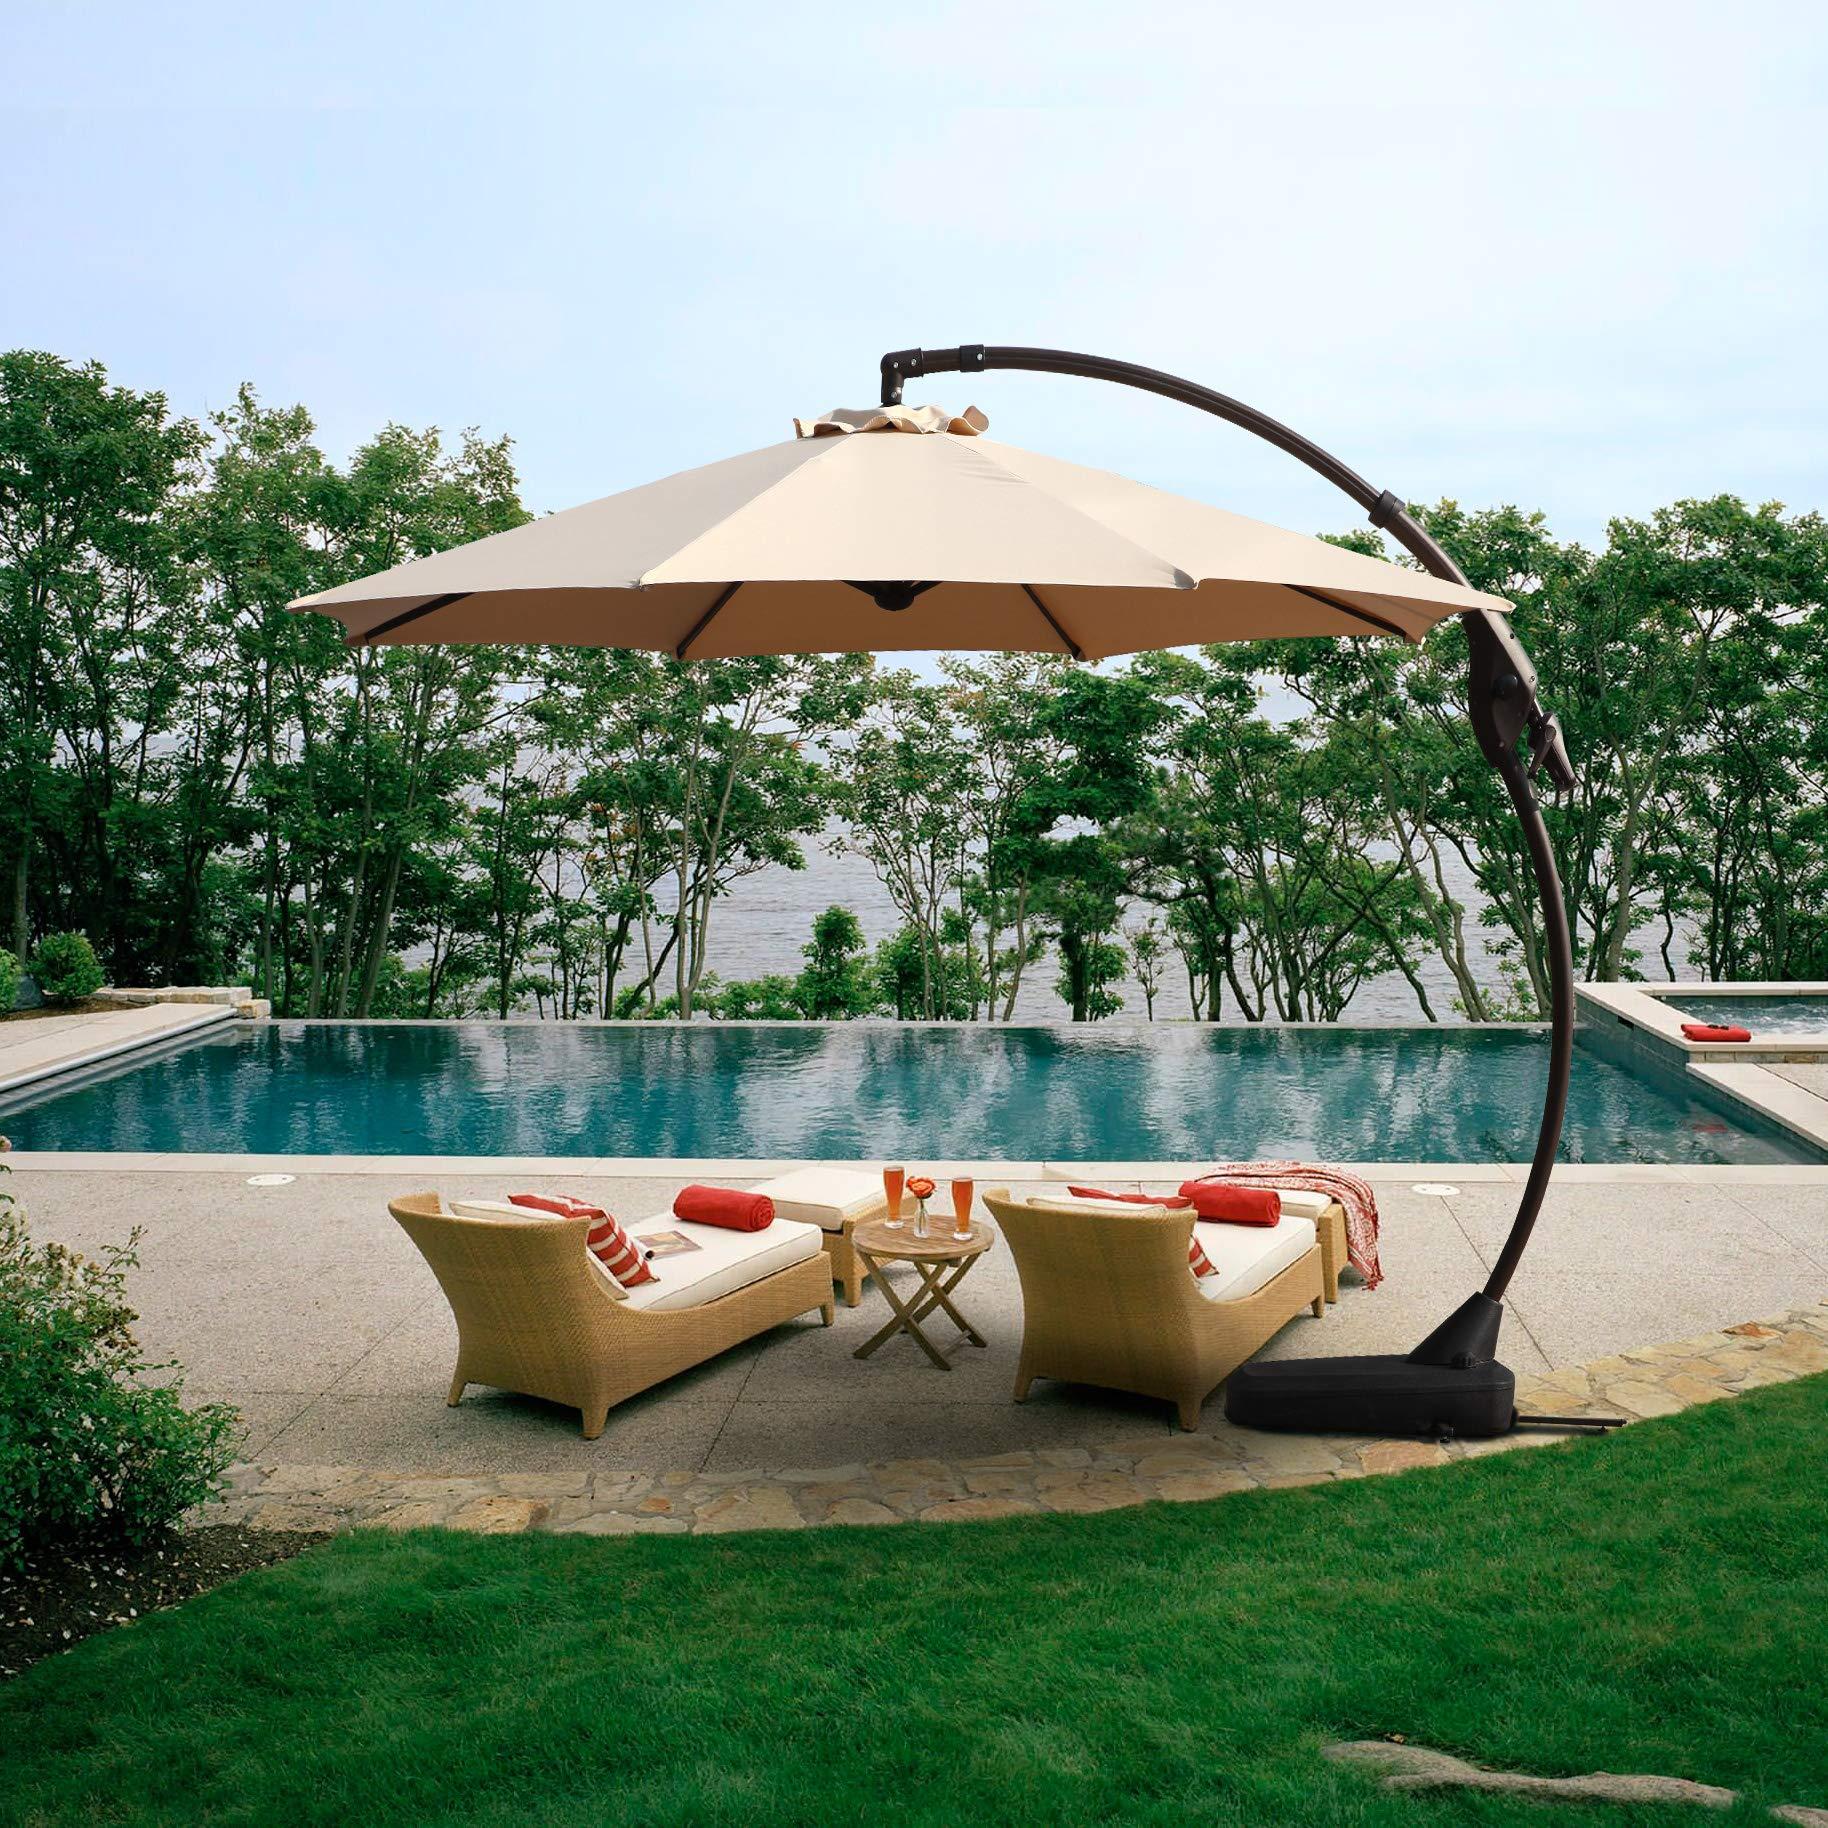 Grand Patio Napoli Deluxe 11 FT Curvy Aluminum Offset Umbrella, Patio Cantilever Umbrella with Base, Champagne by Grand Patio (Image #2)